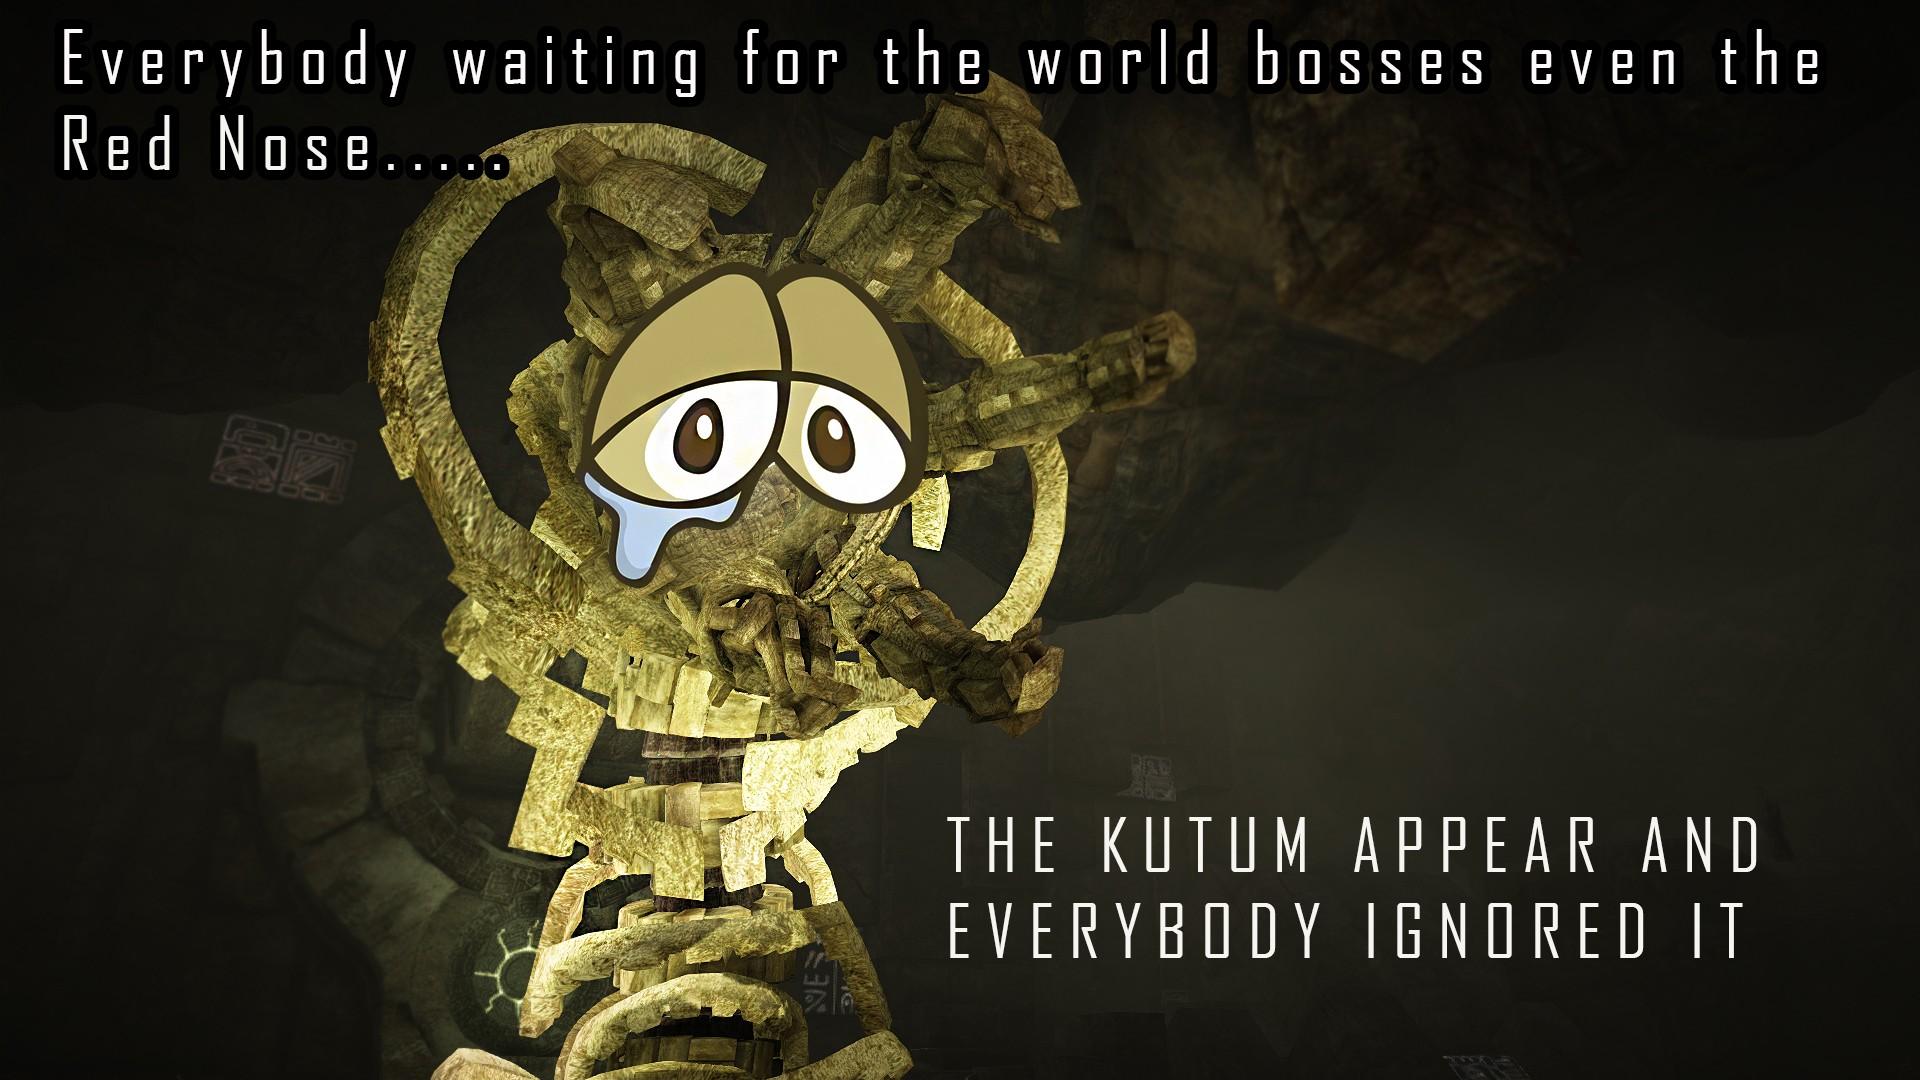 Black Desert Online: Nouver or Kutum: The History of boss off-hands